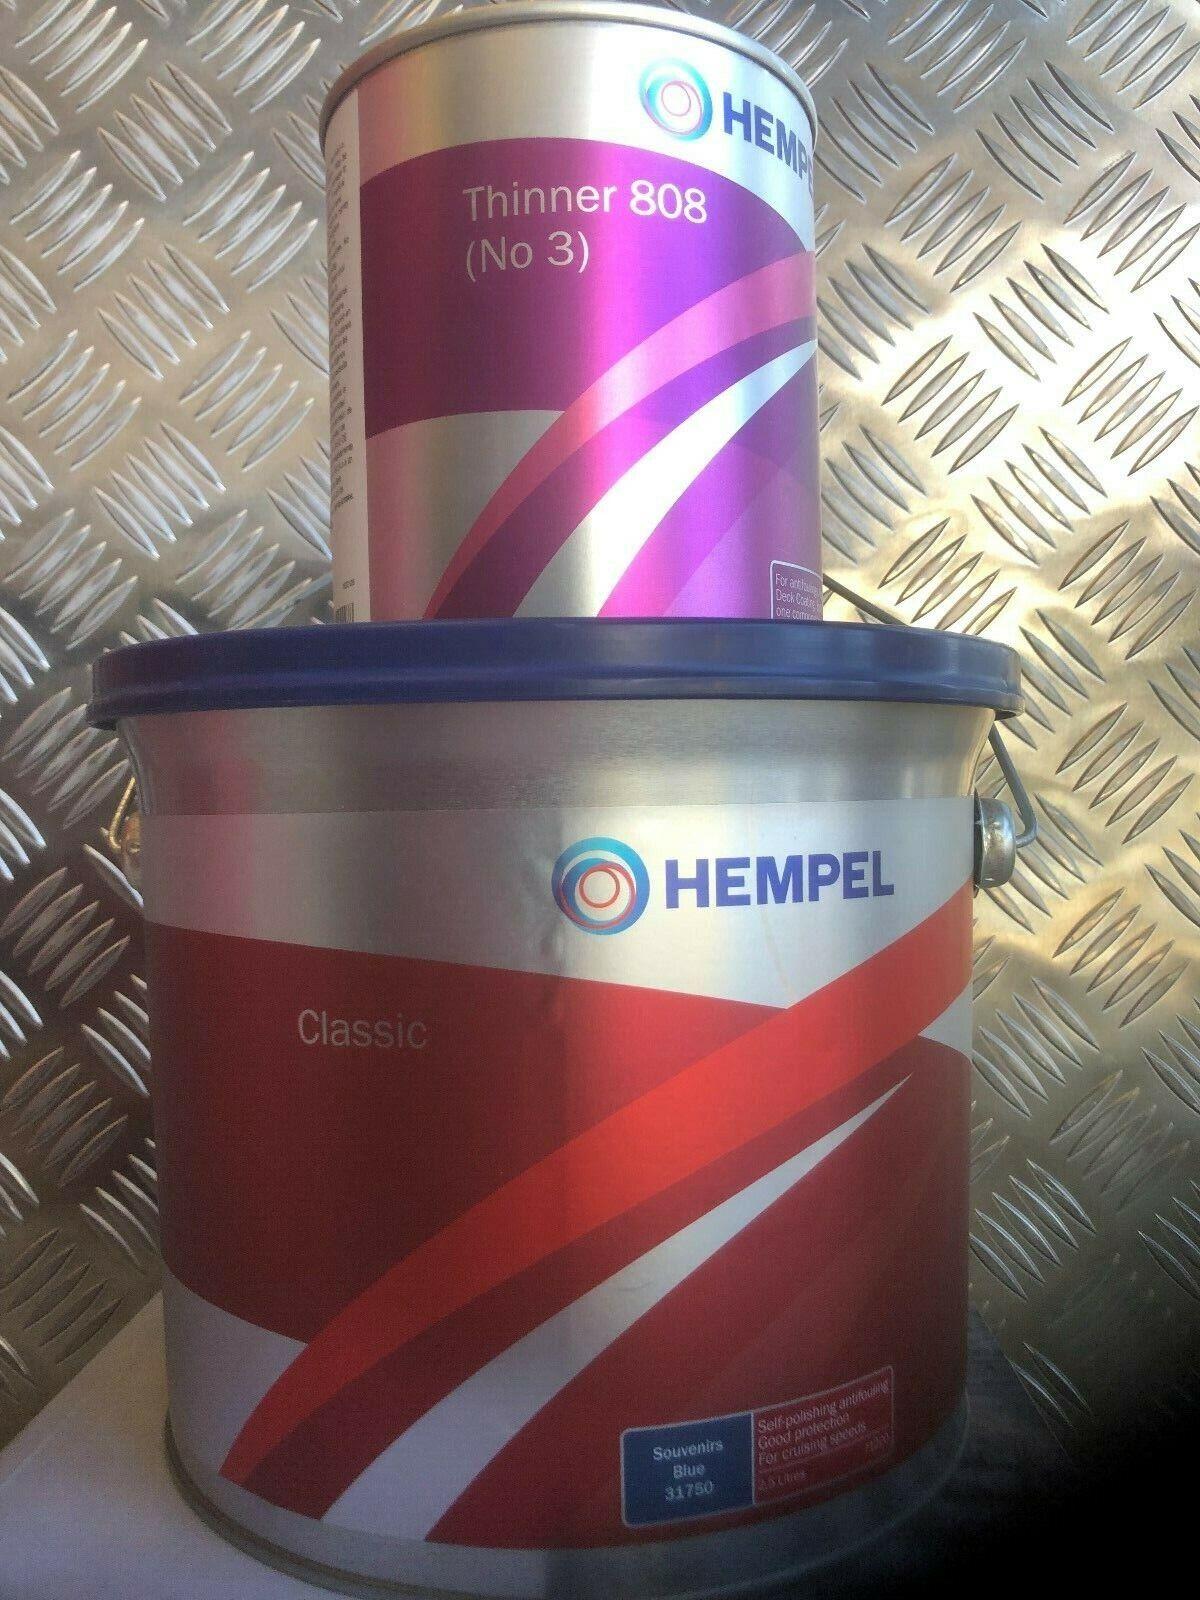 HEMPEL CLASSIC ANTIFOULING - 2.5LTR & NO3 THINNER. YACHT FISHING DAY BOATING